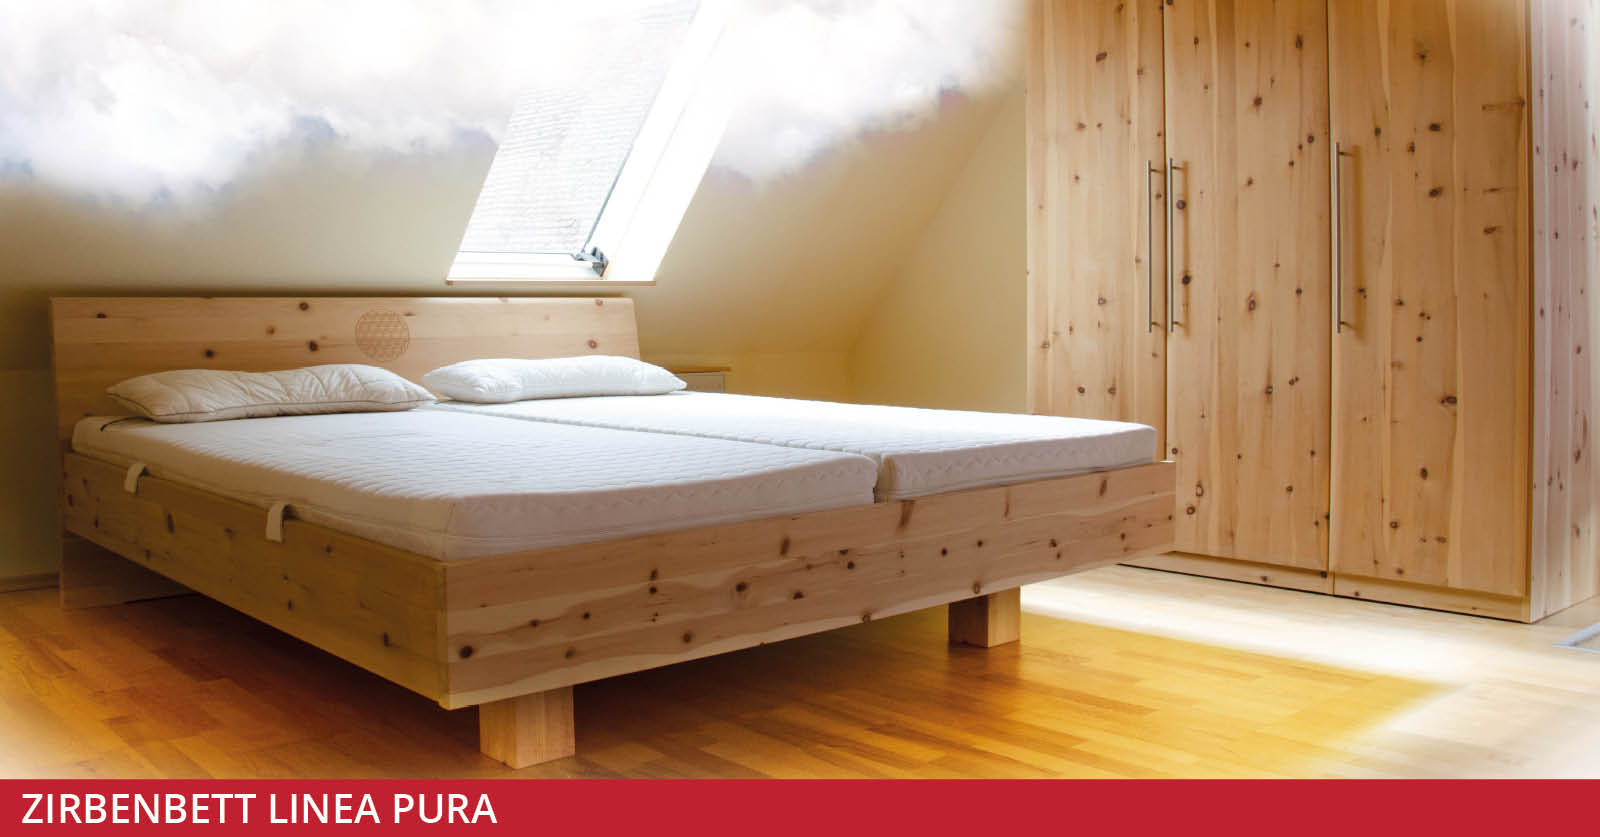 zirbenbett-linea-pura-2